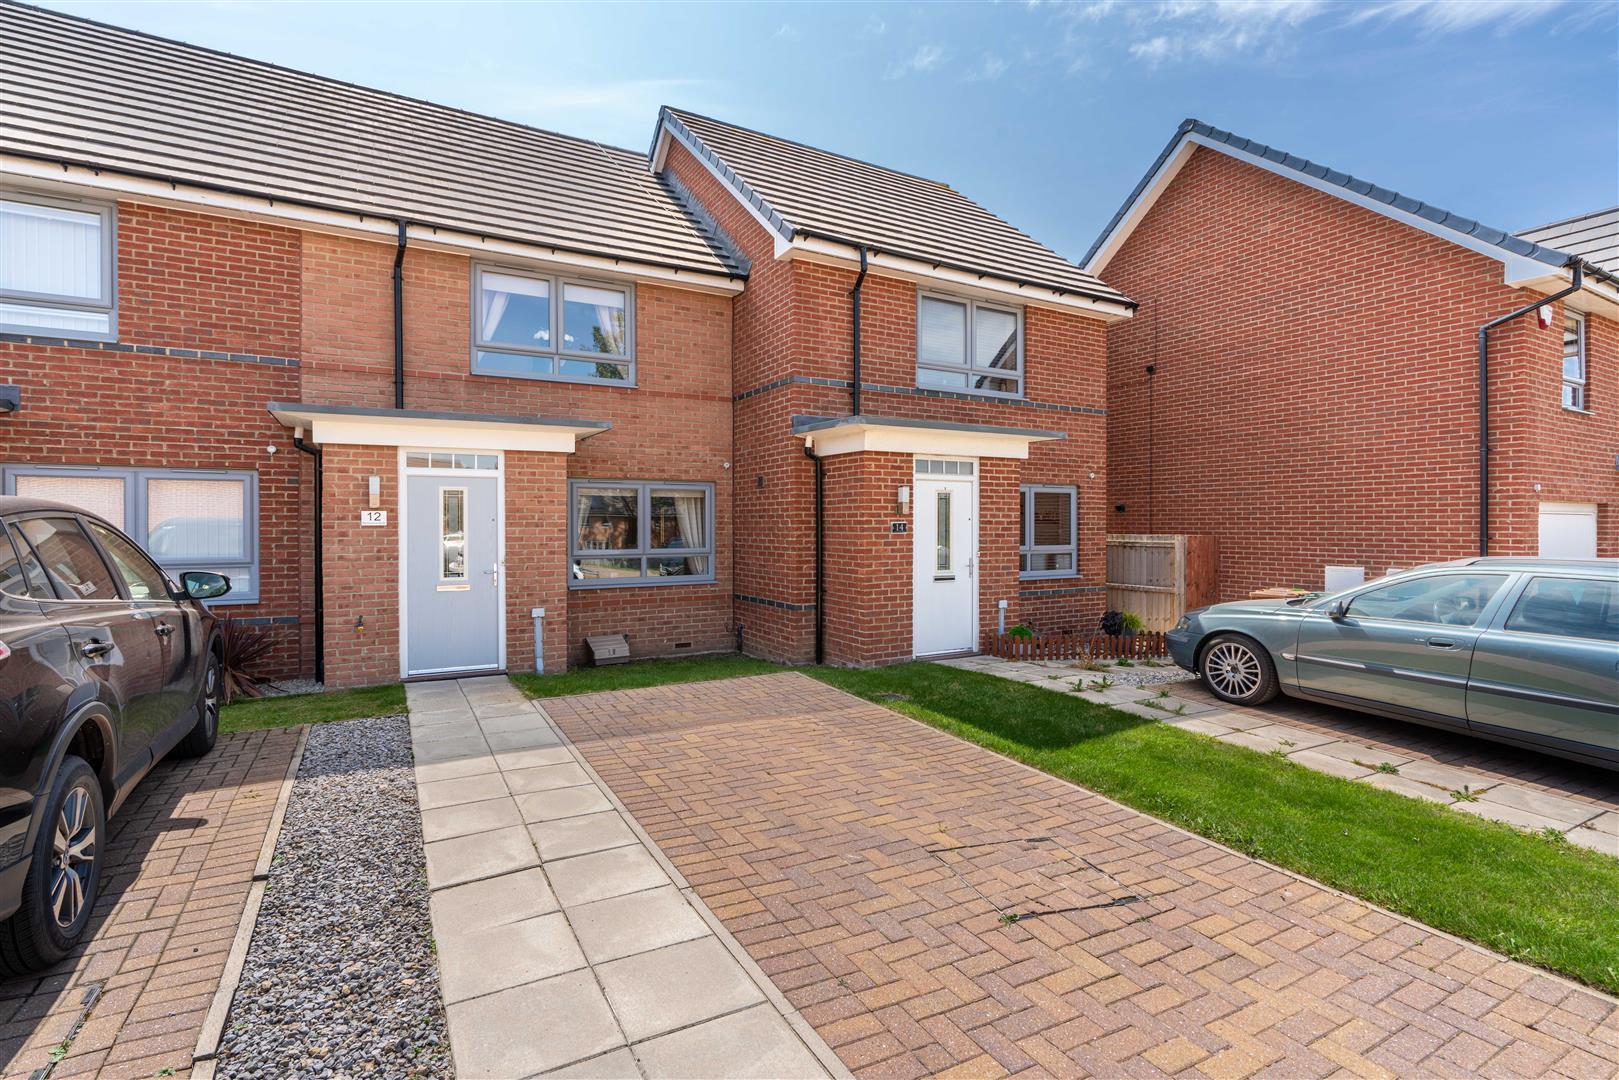 2 bed terraced house for sale in Byrewood Walk, Kenton, NE3